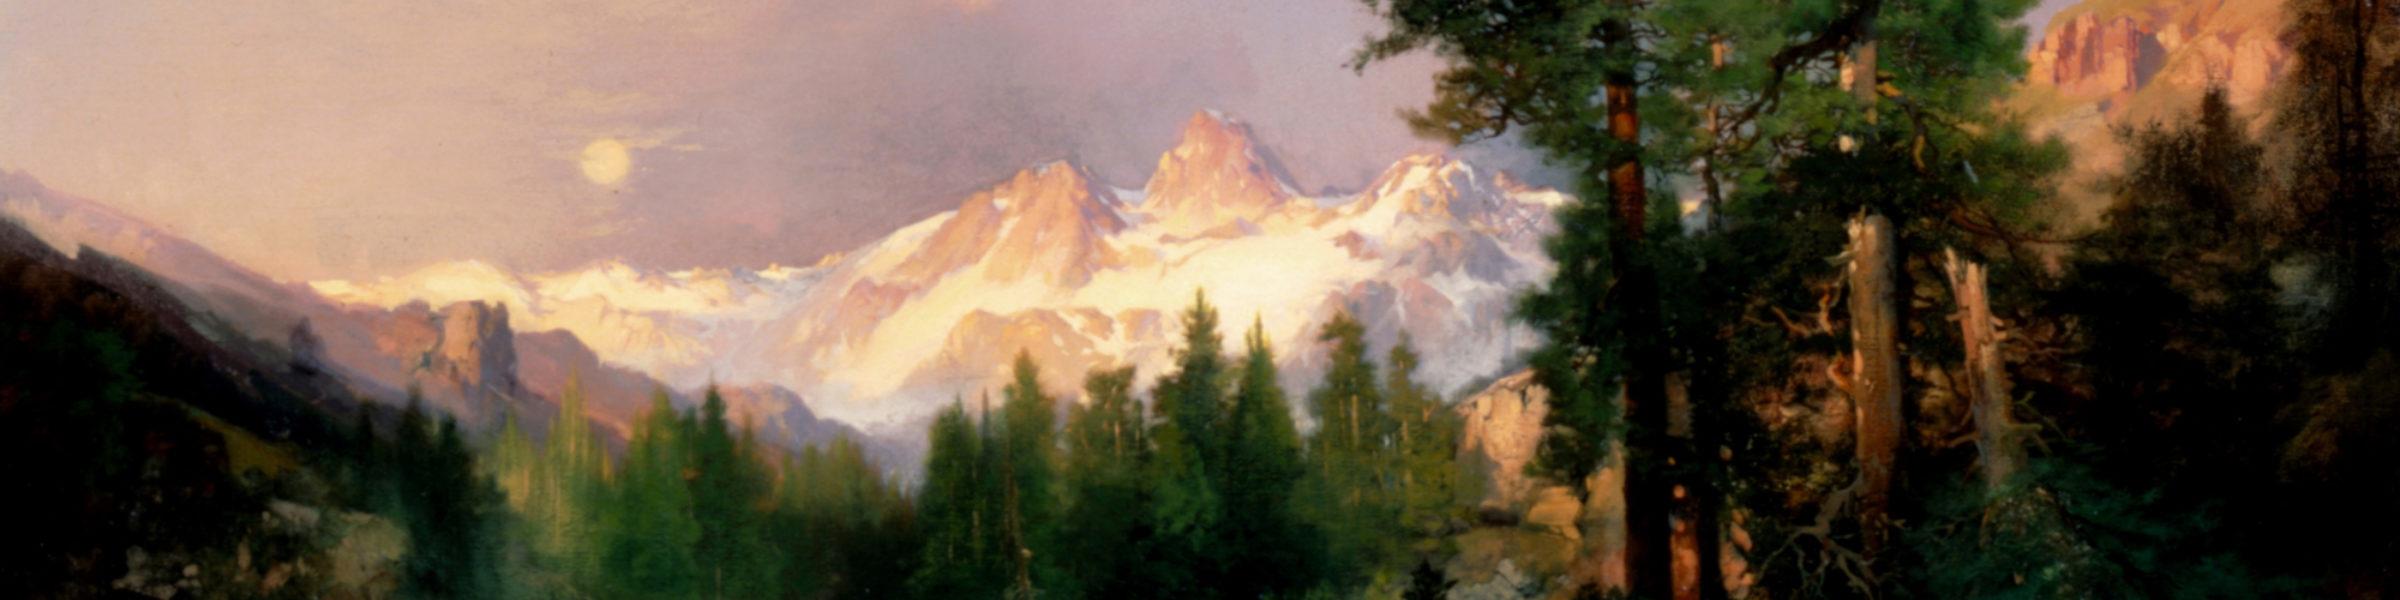 The wilderness pod banner